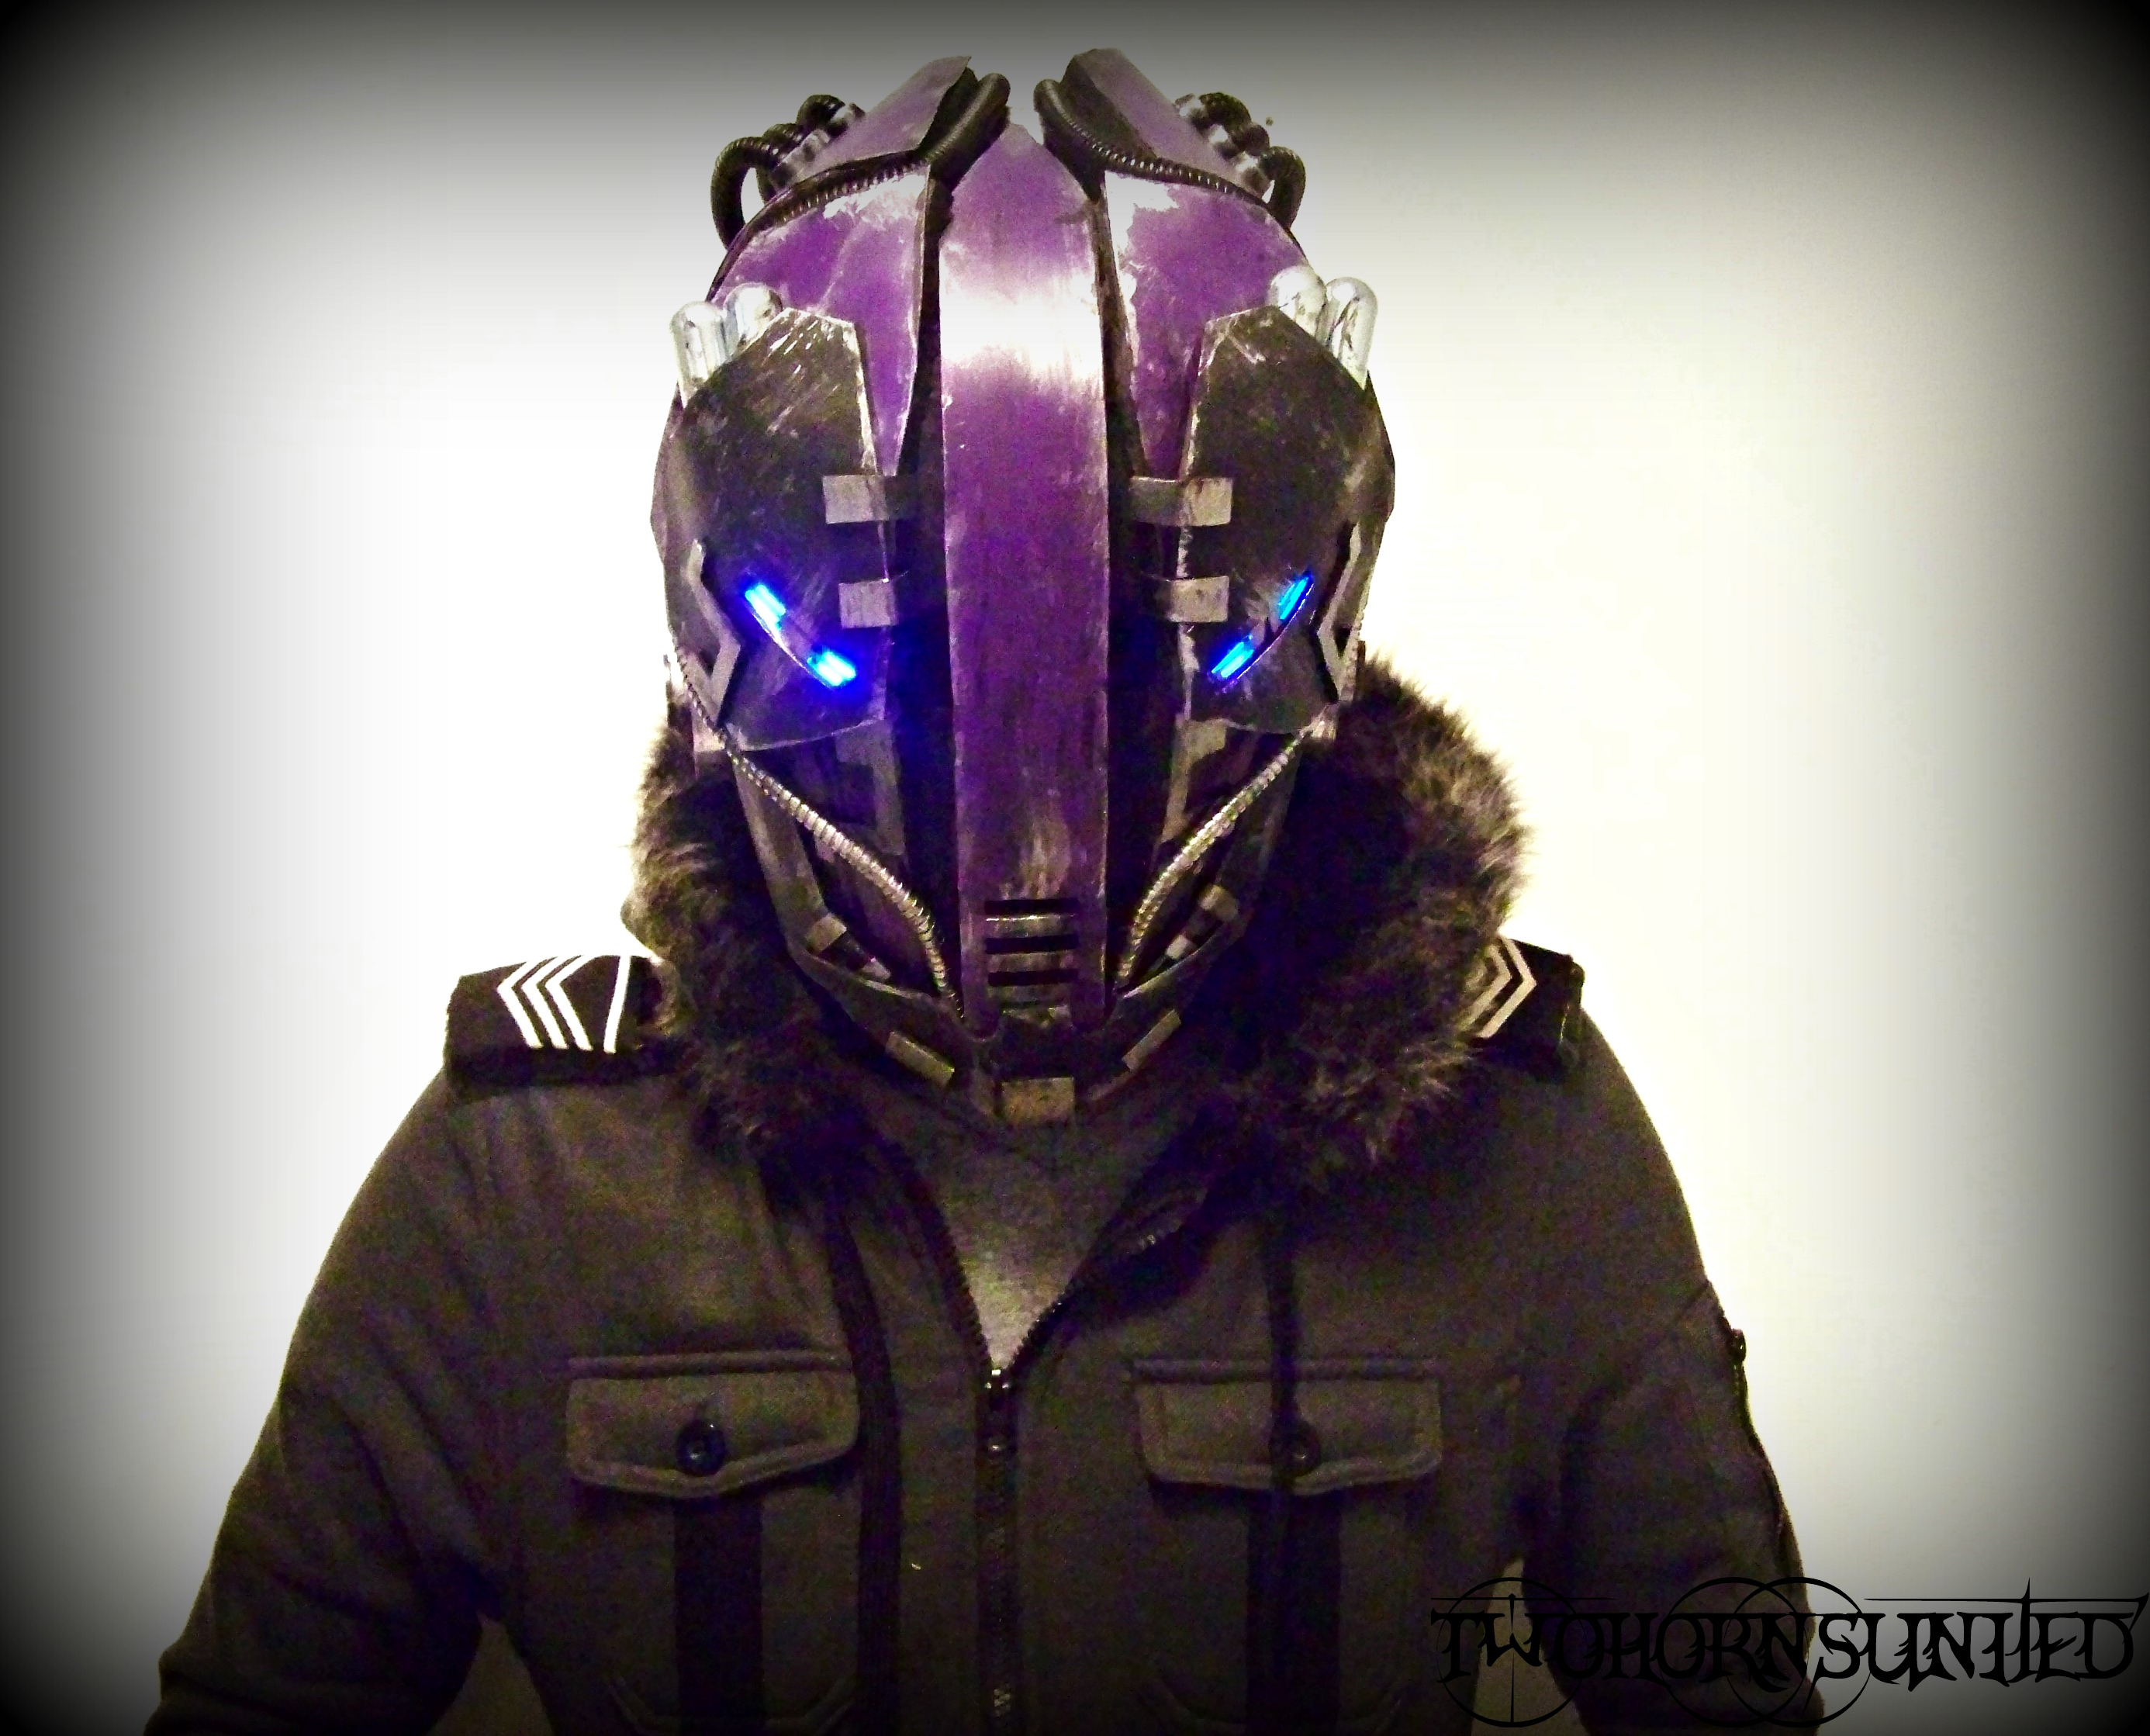 The K WiR3 Cyberpunk Helmet By TwoHornsUnited On DeviantArt